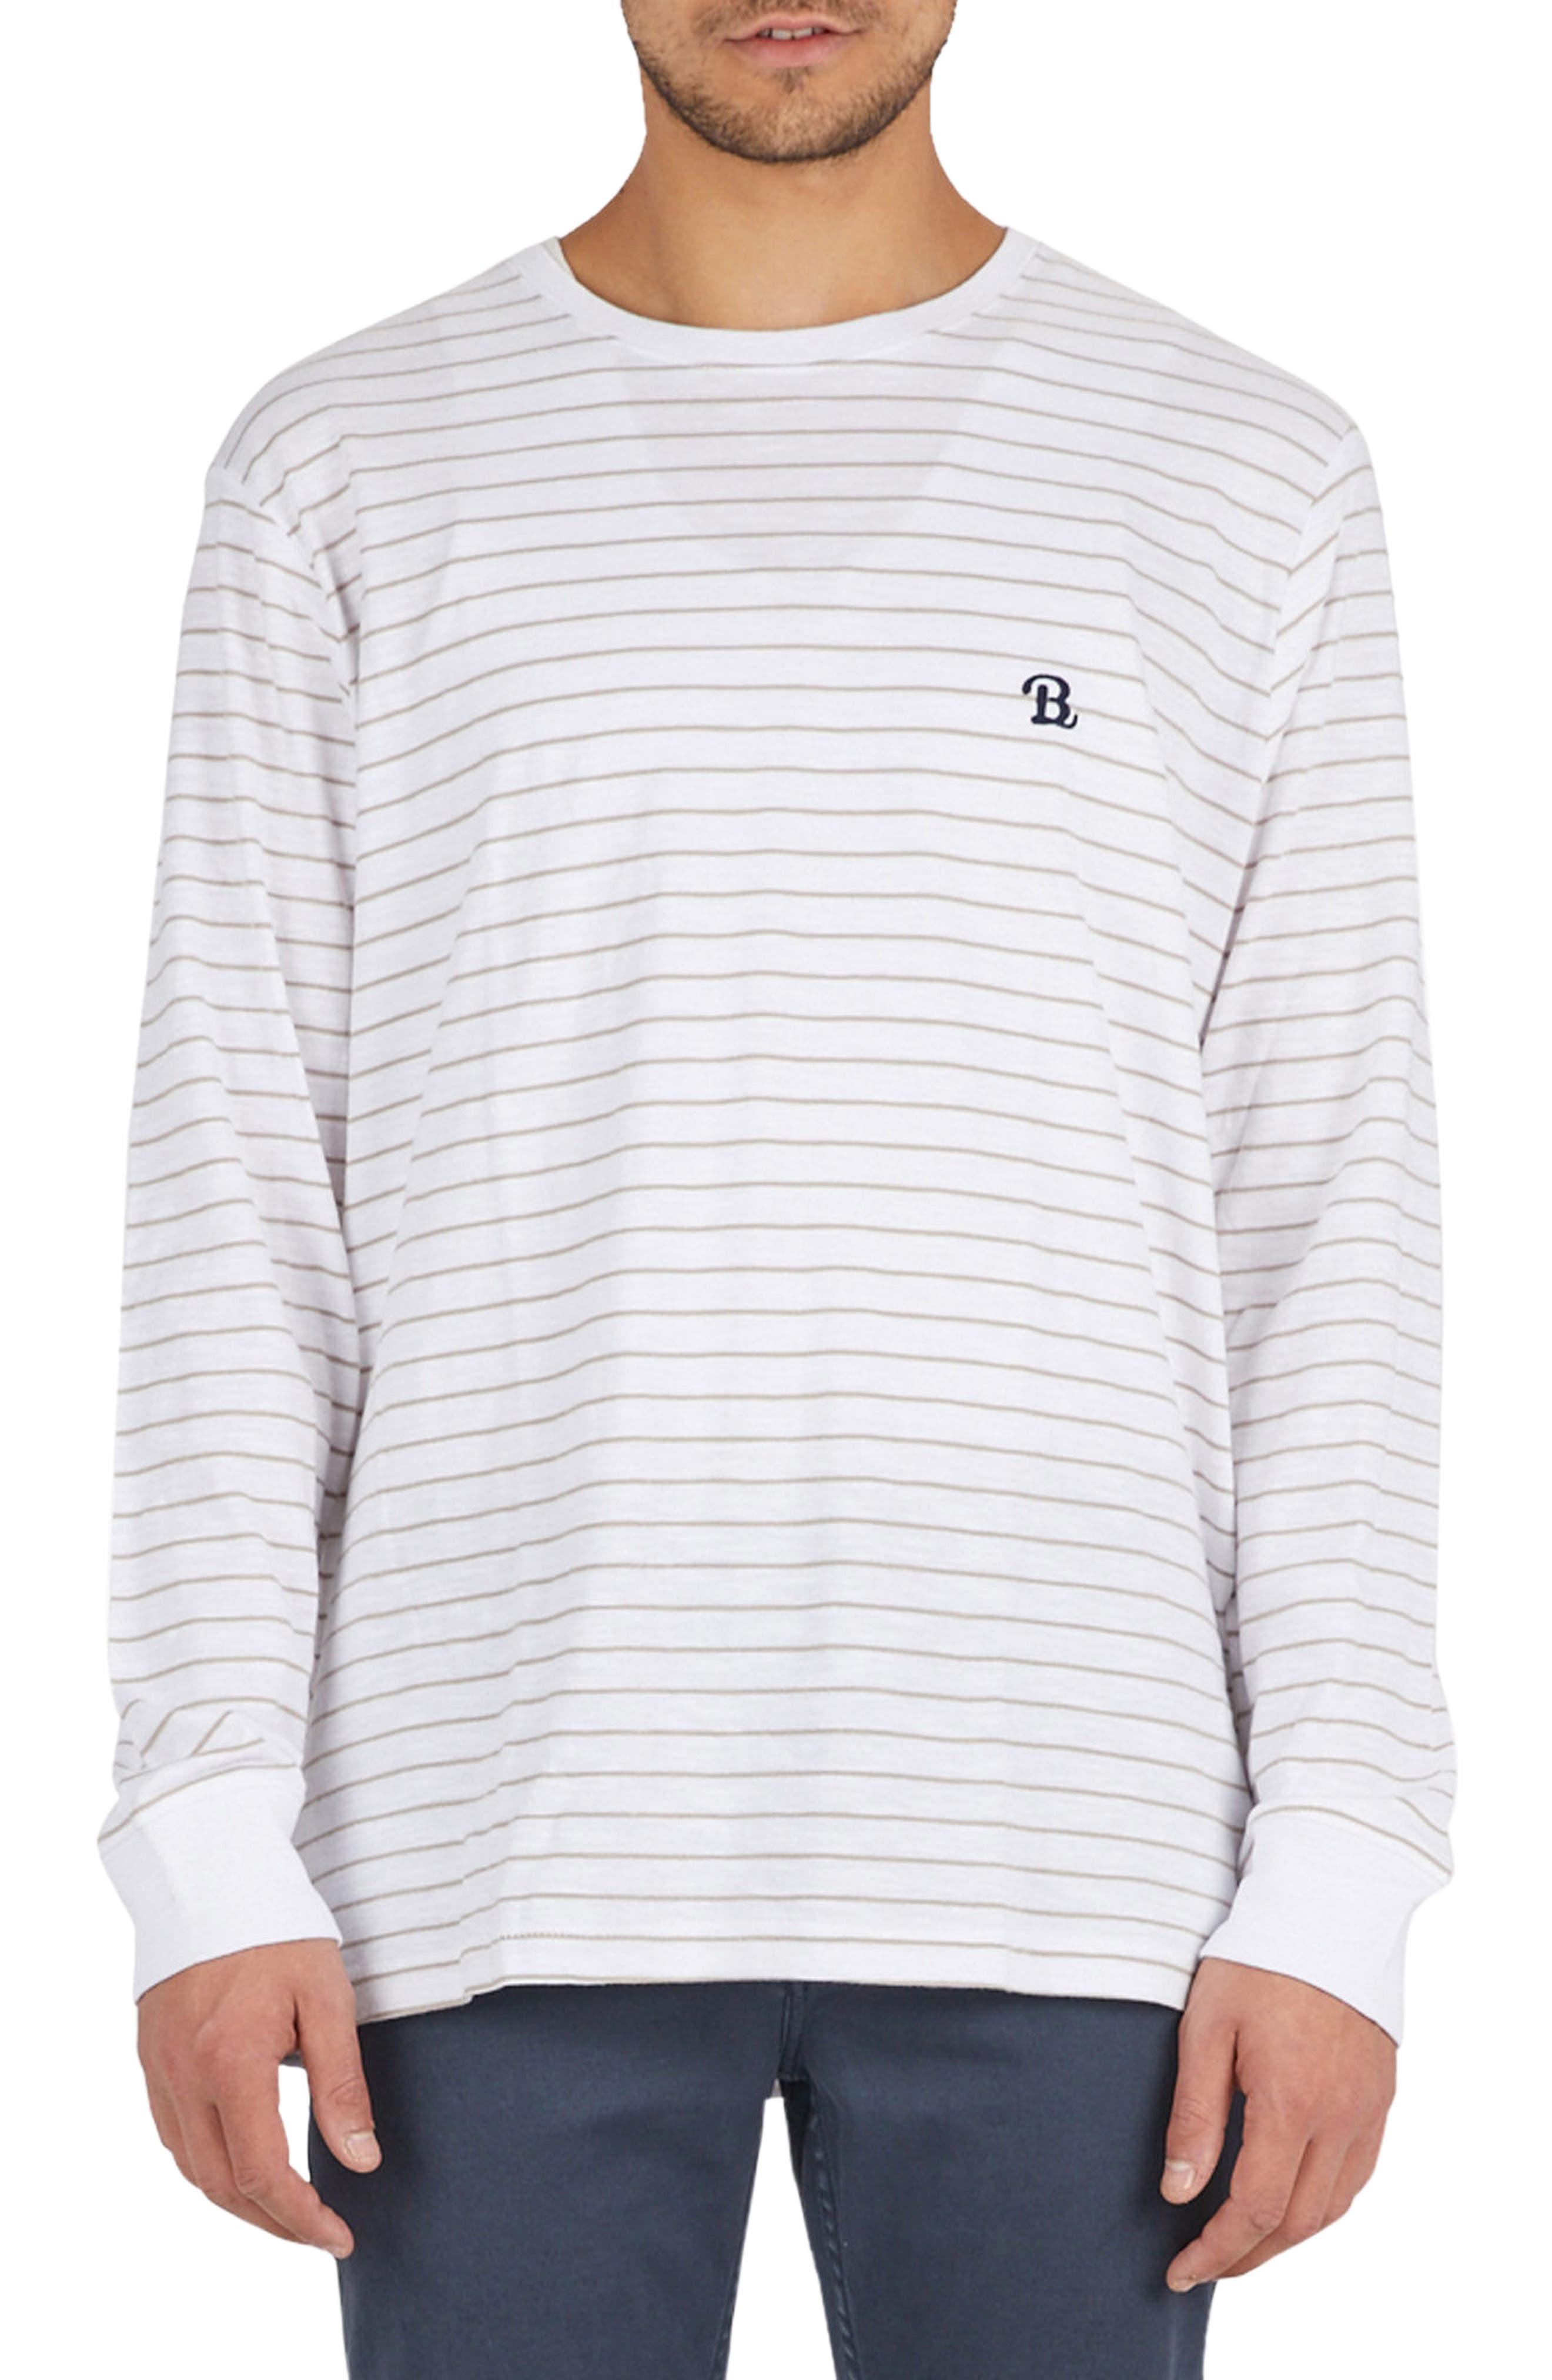 B. Schooled T-Shirt,                             Main thumbnail 1, color,                             Beige Stripe